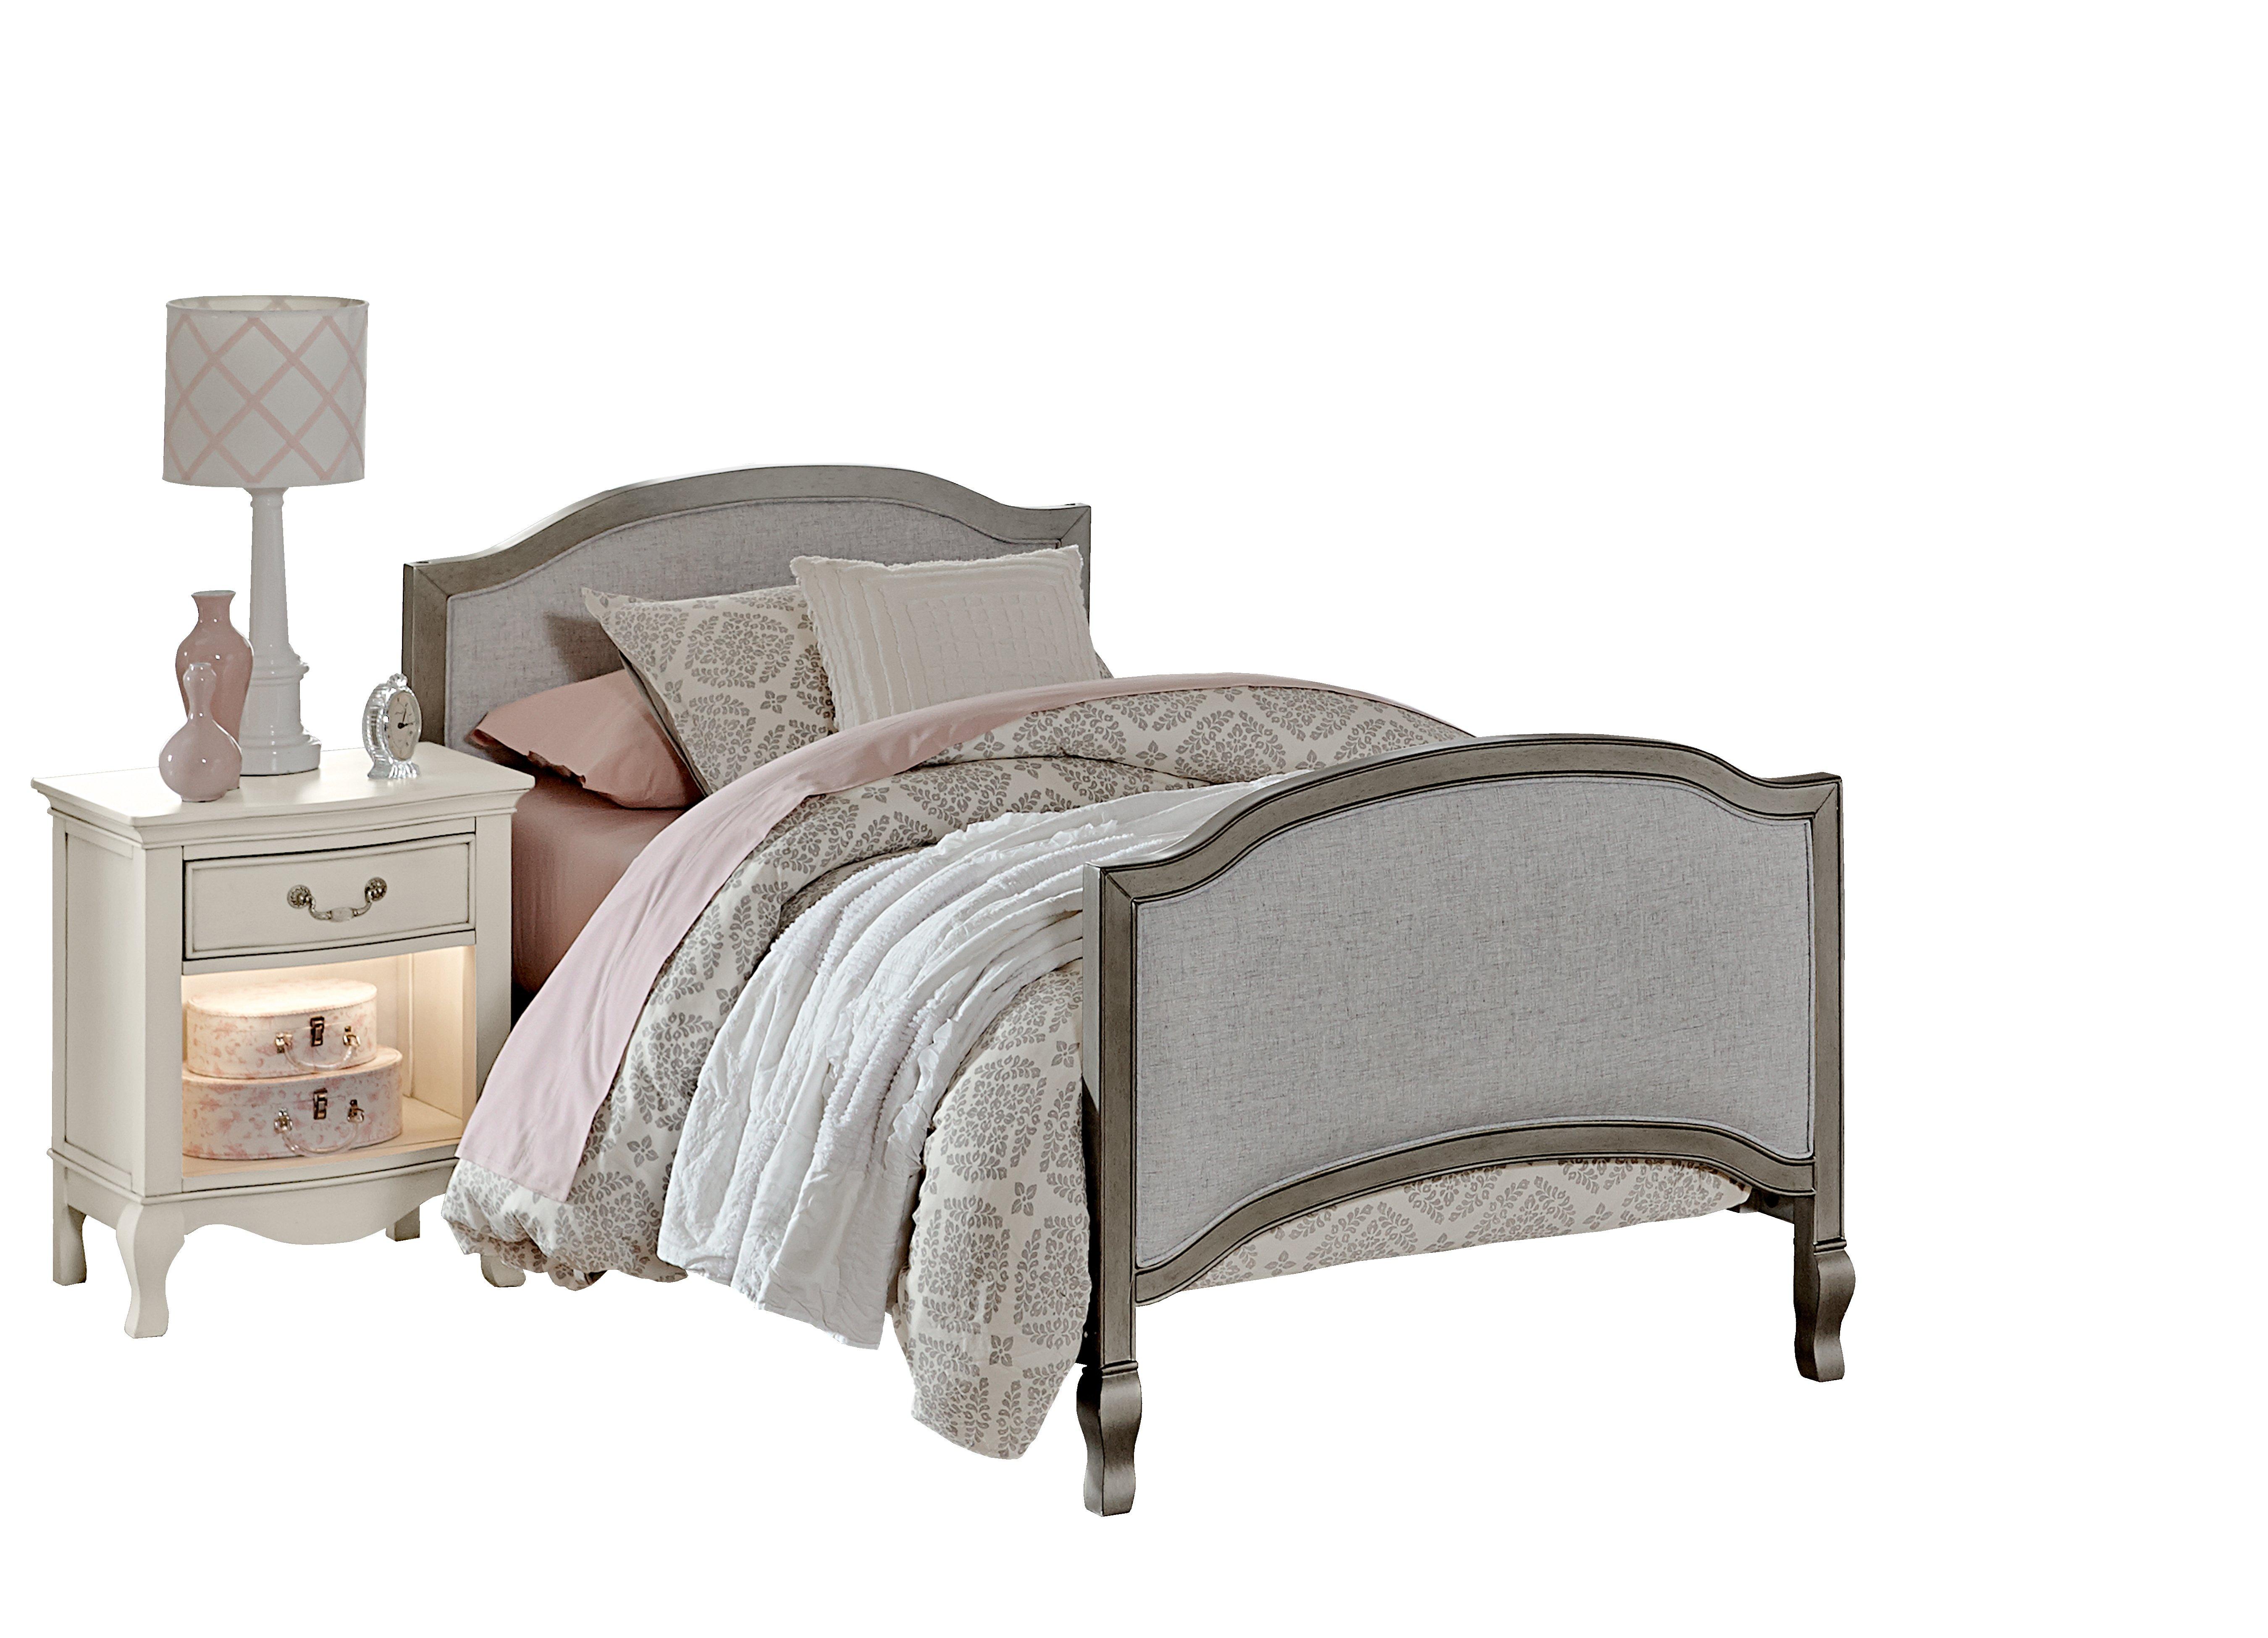 Kensington Victoria Upholstered Panel Bed